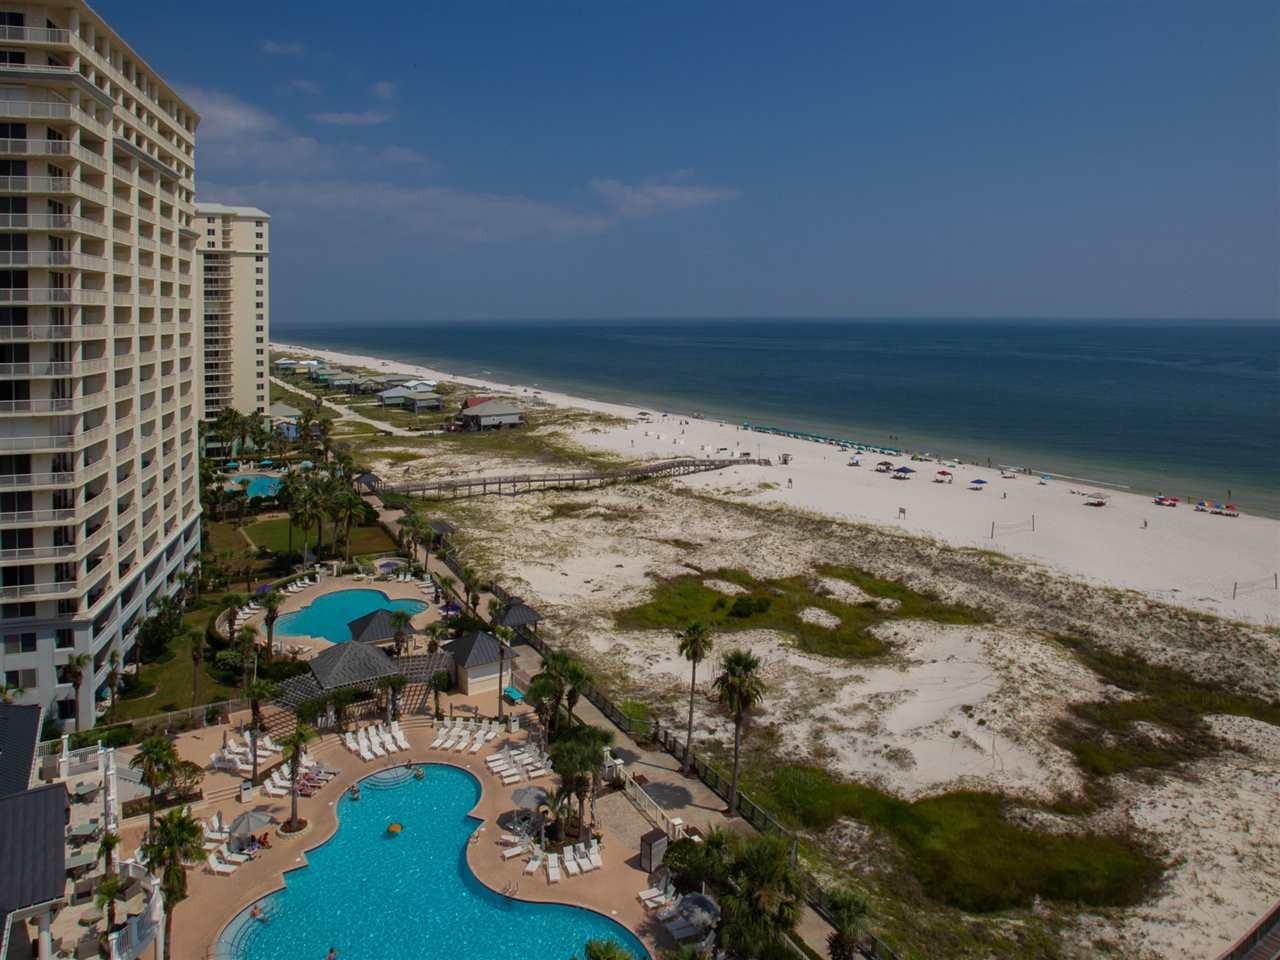 Beach Club Resort Gulf Shores Address